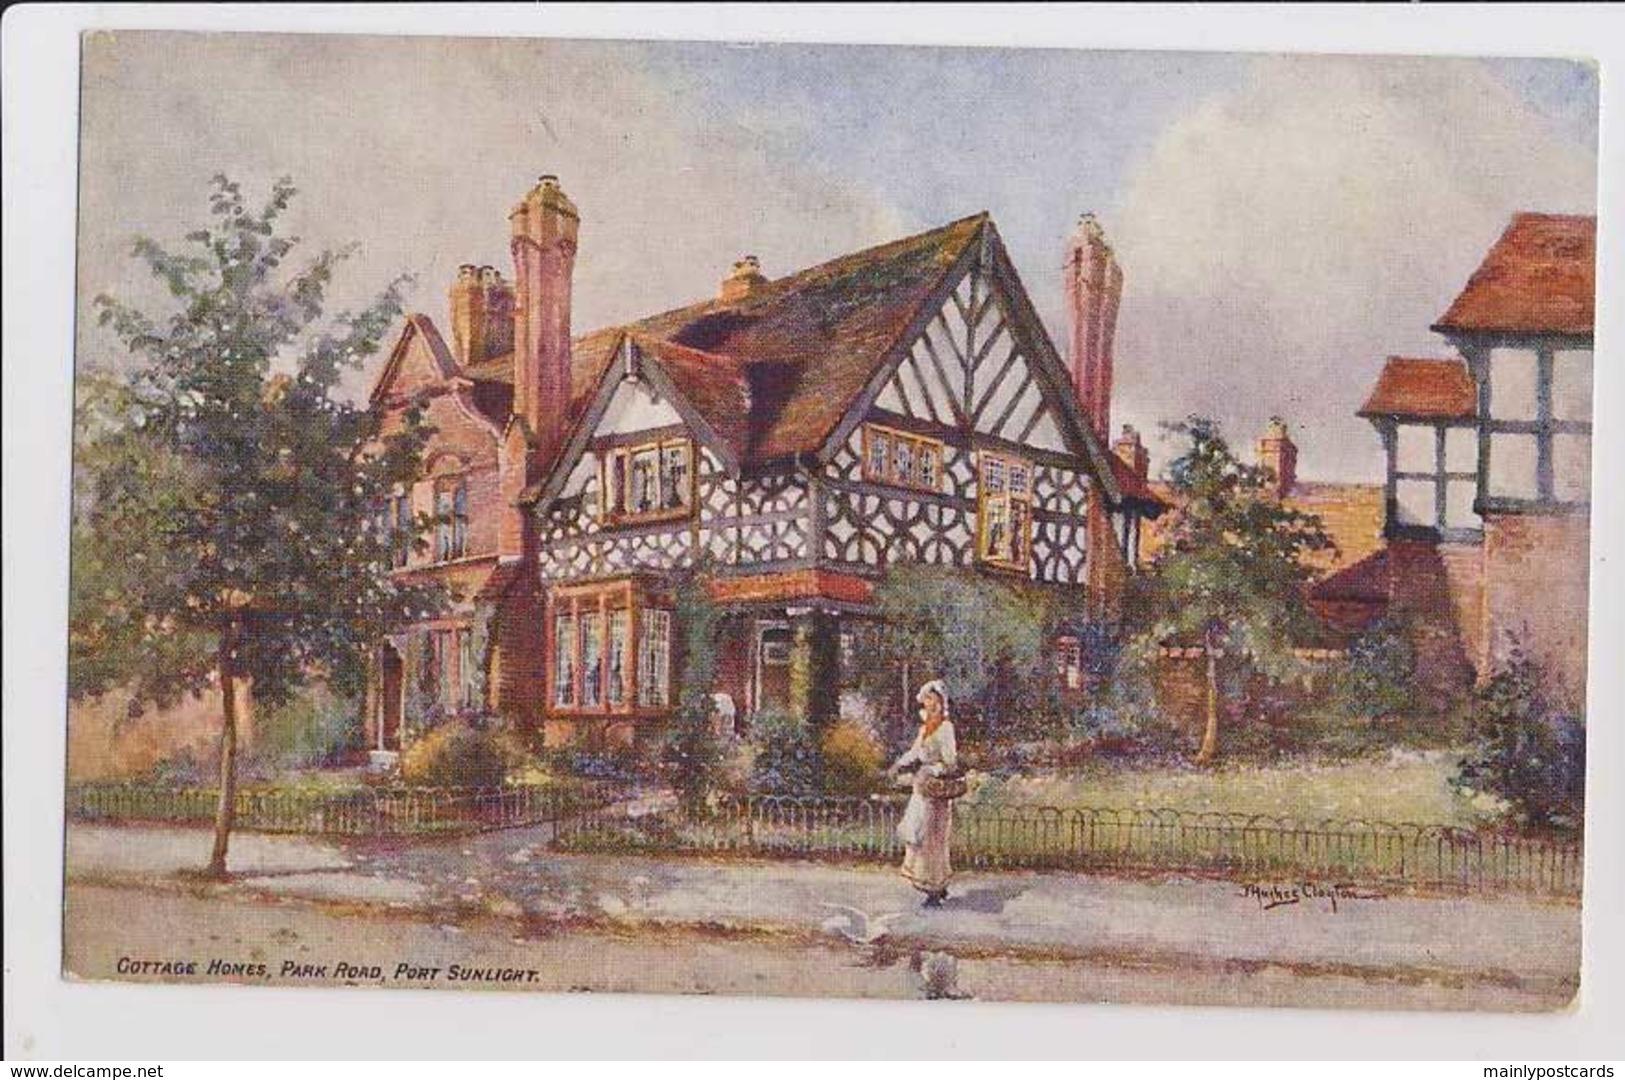 AI77 Cottage Homes, Park Road, Port Sunlight - Artist Signed - England